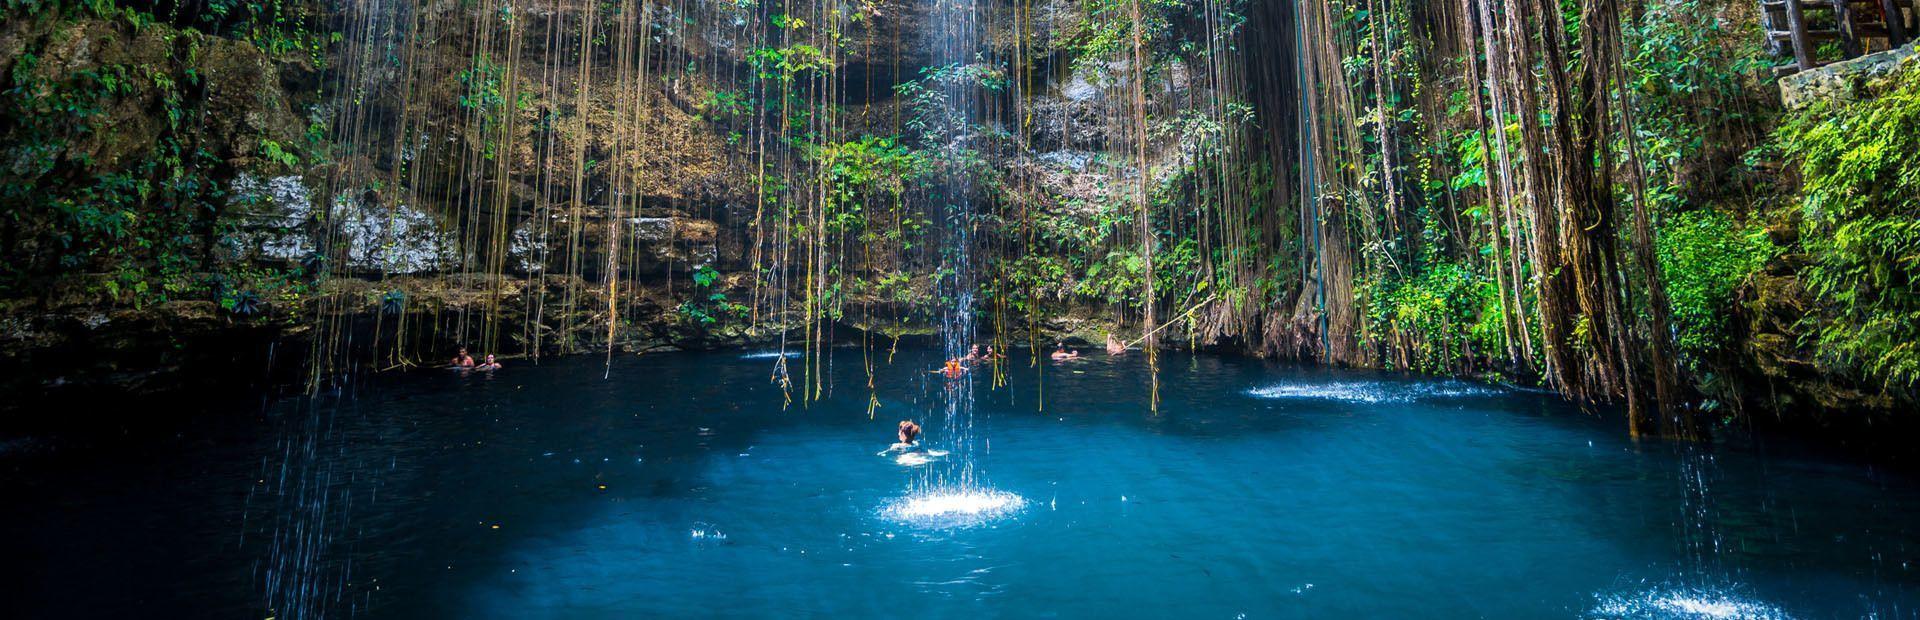 Messico: lo Yucatan dei Maya